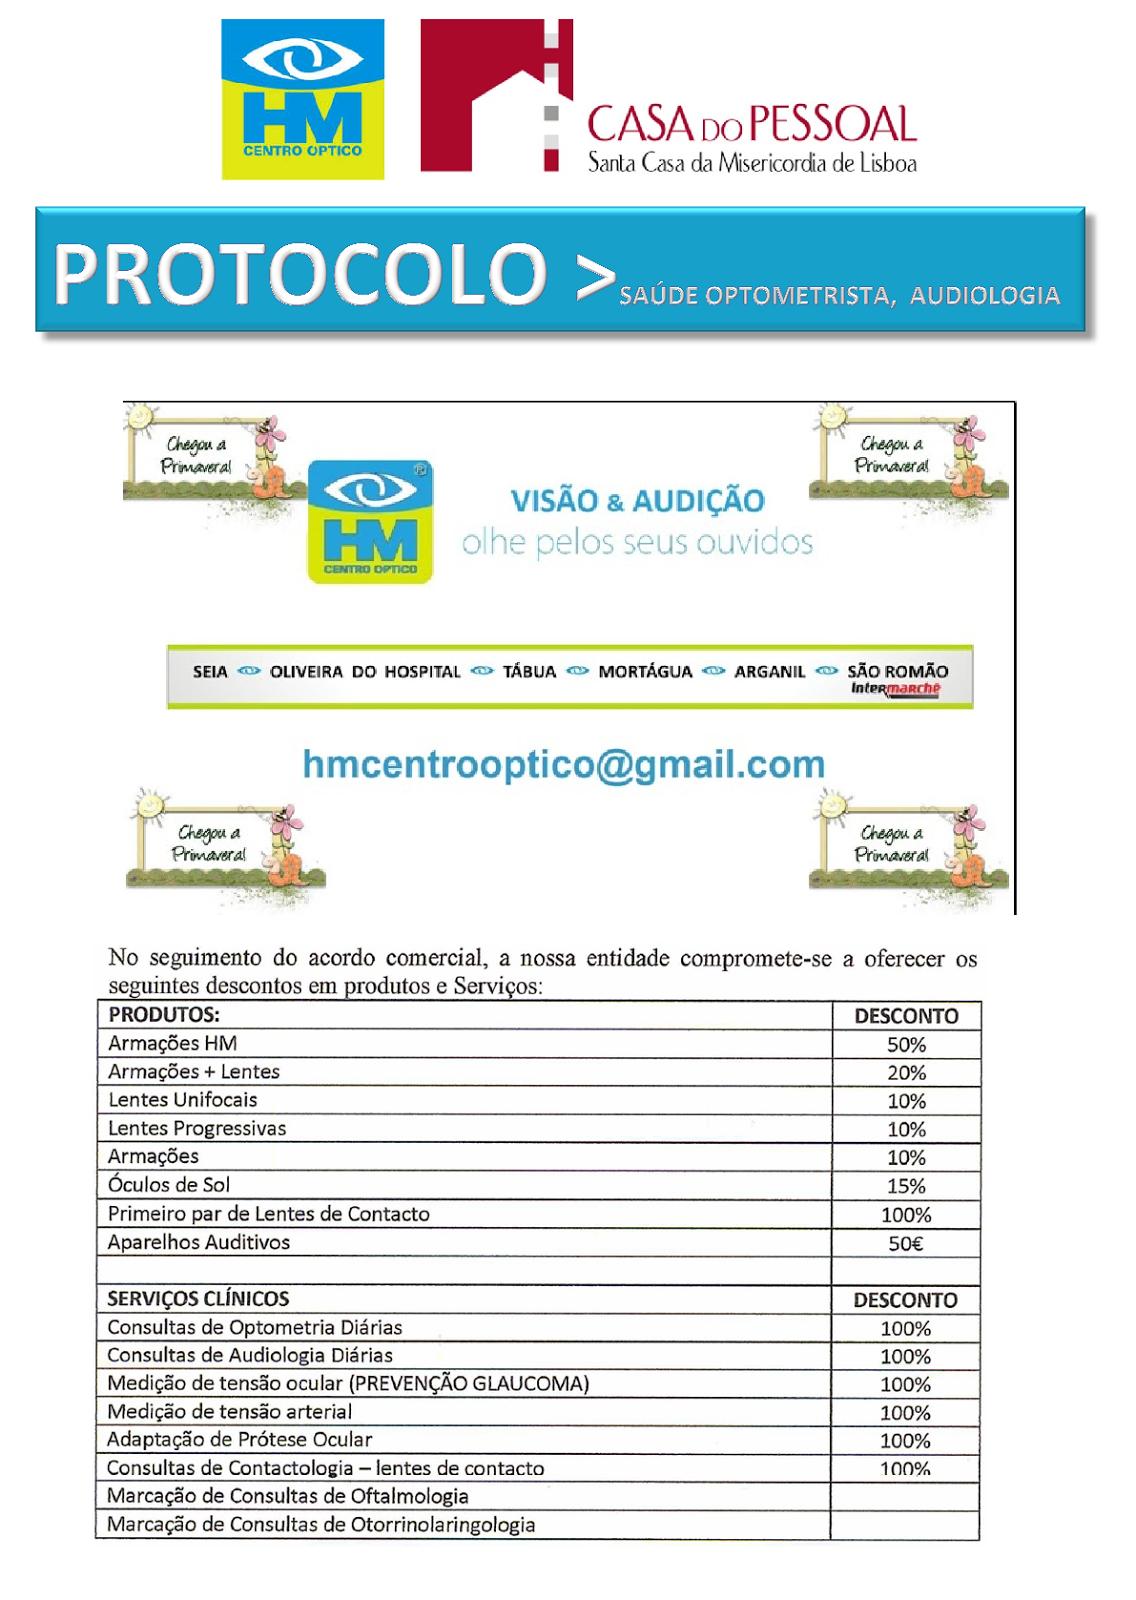 http://hmcentrooptico.blogspot.pt/